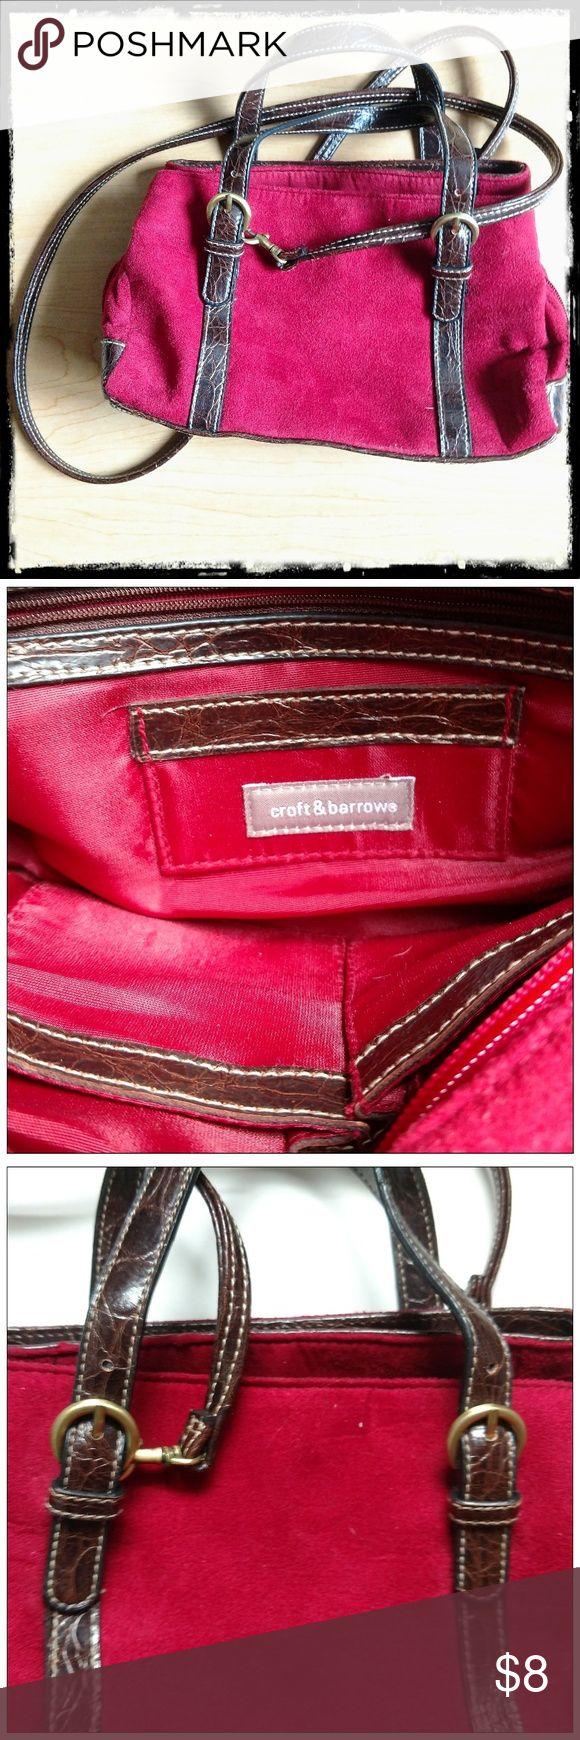 Shoulder/cross-body/small satchel-style purse Convertible Croft & Barrow bag; 3 …